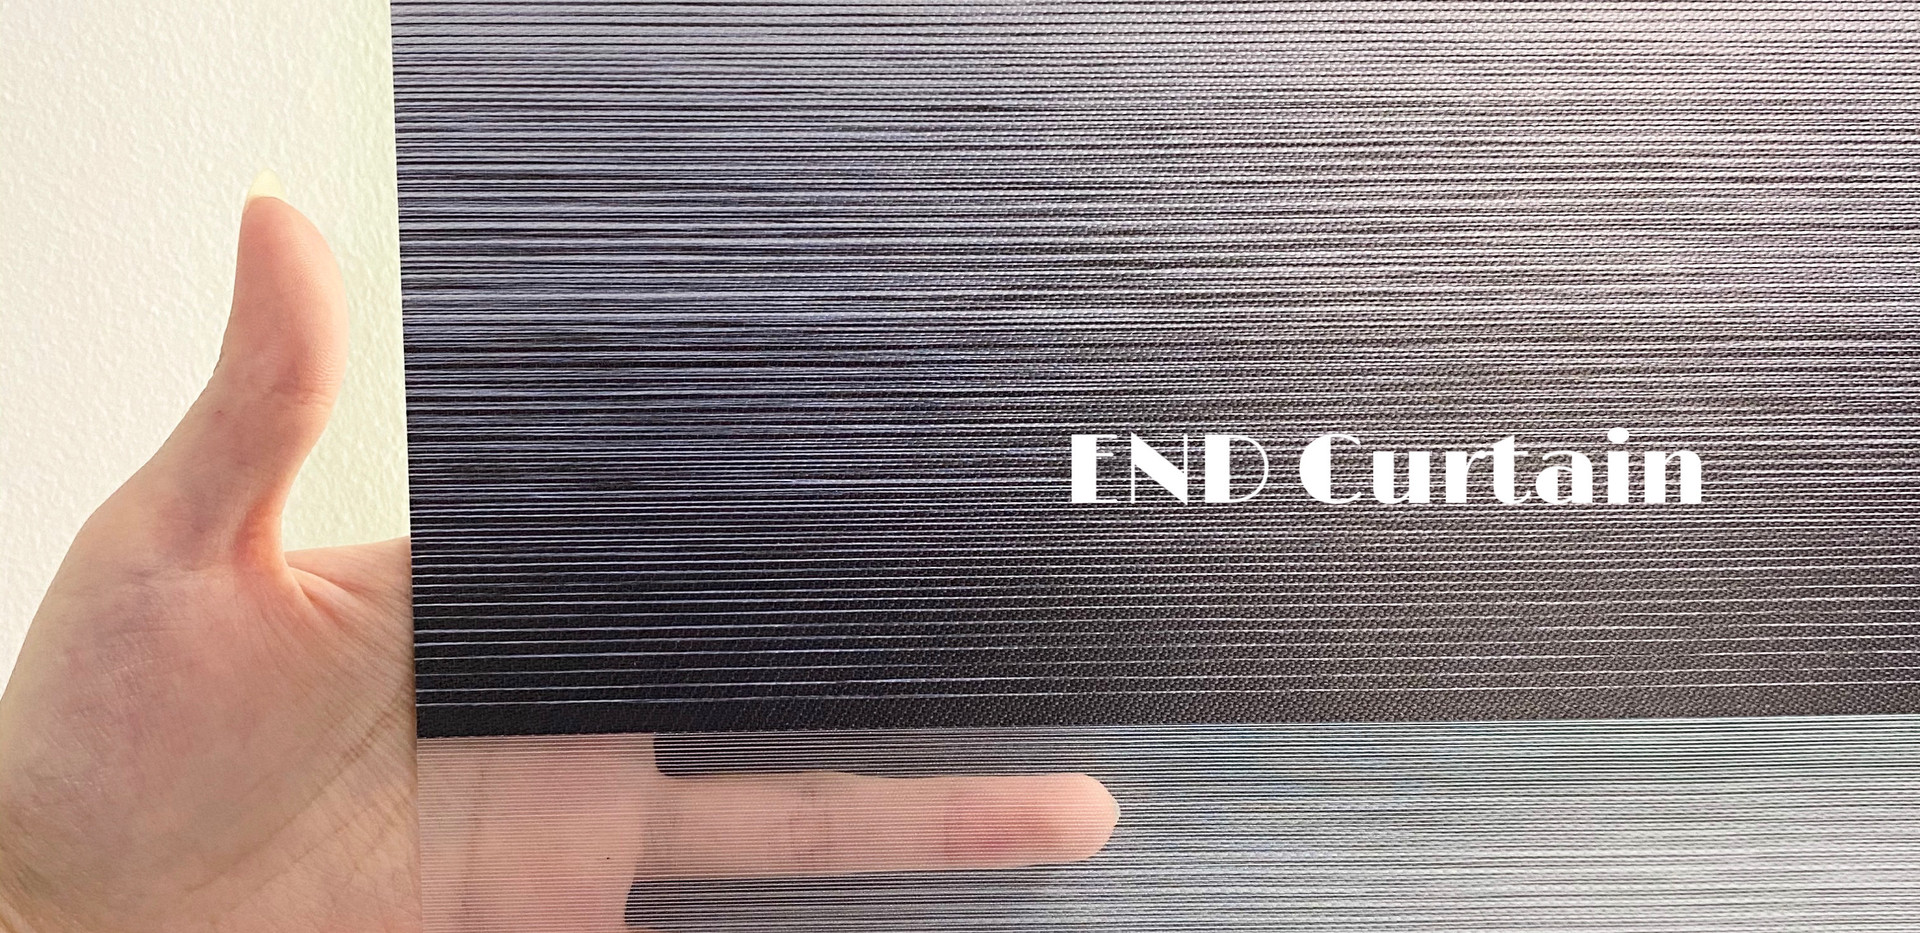 Black Out Korean Combi Blinds Close Up - END CURTAIN Singapore